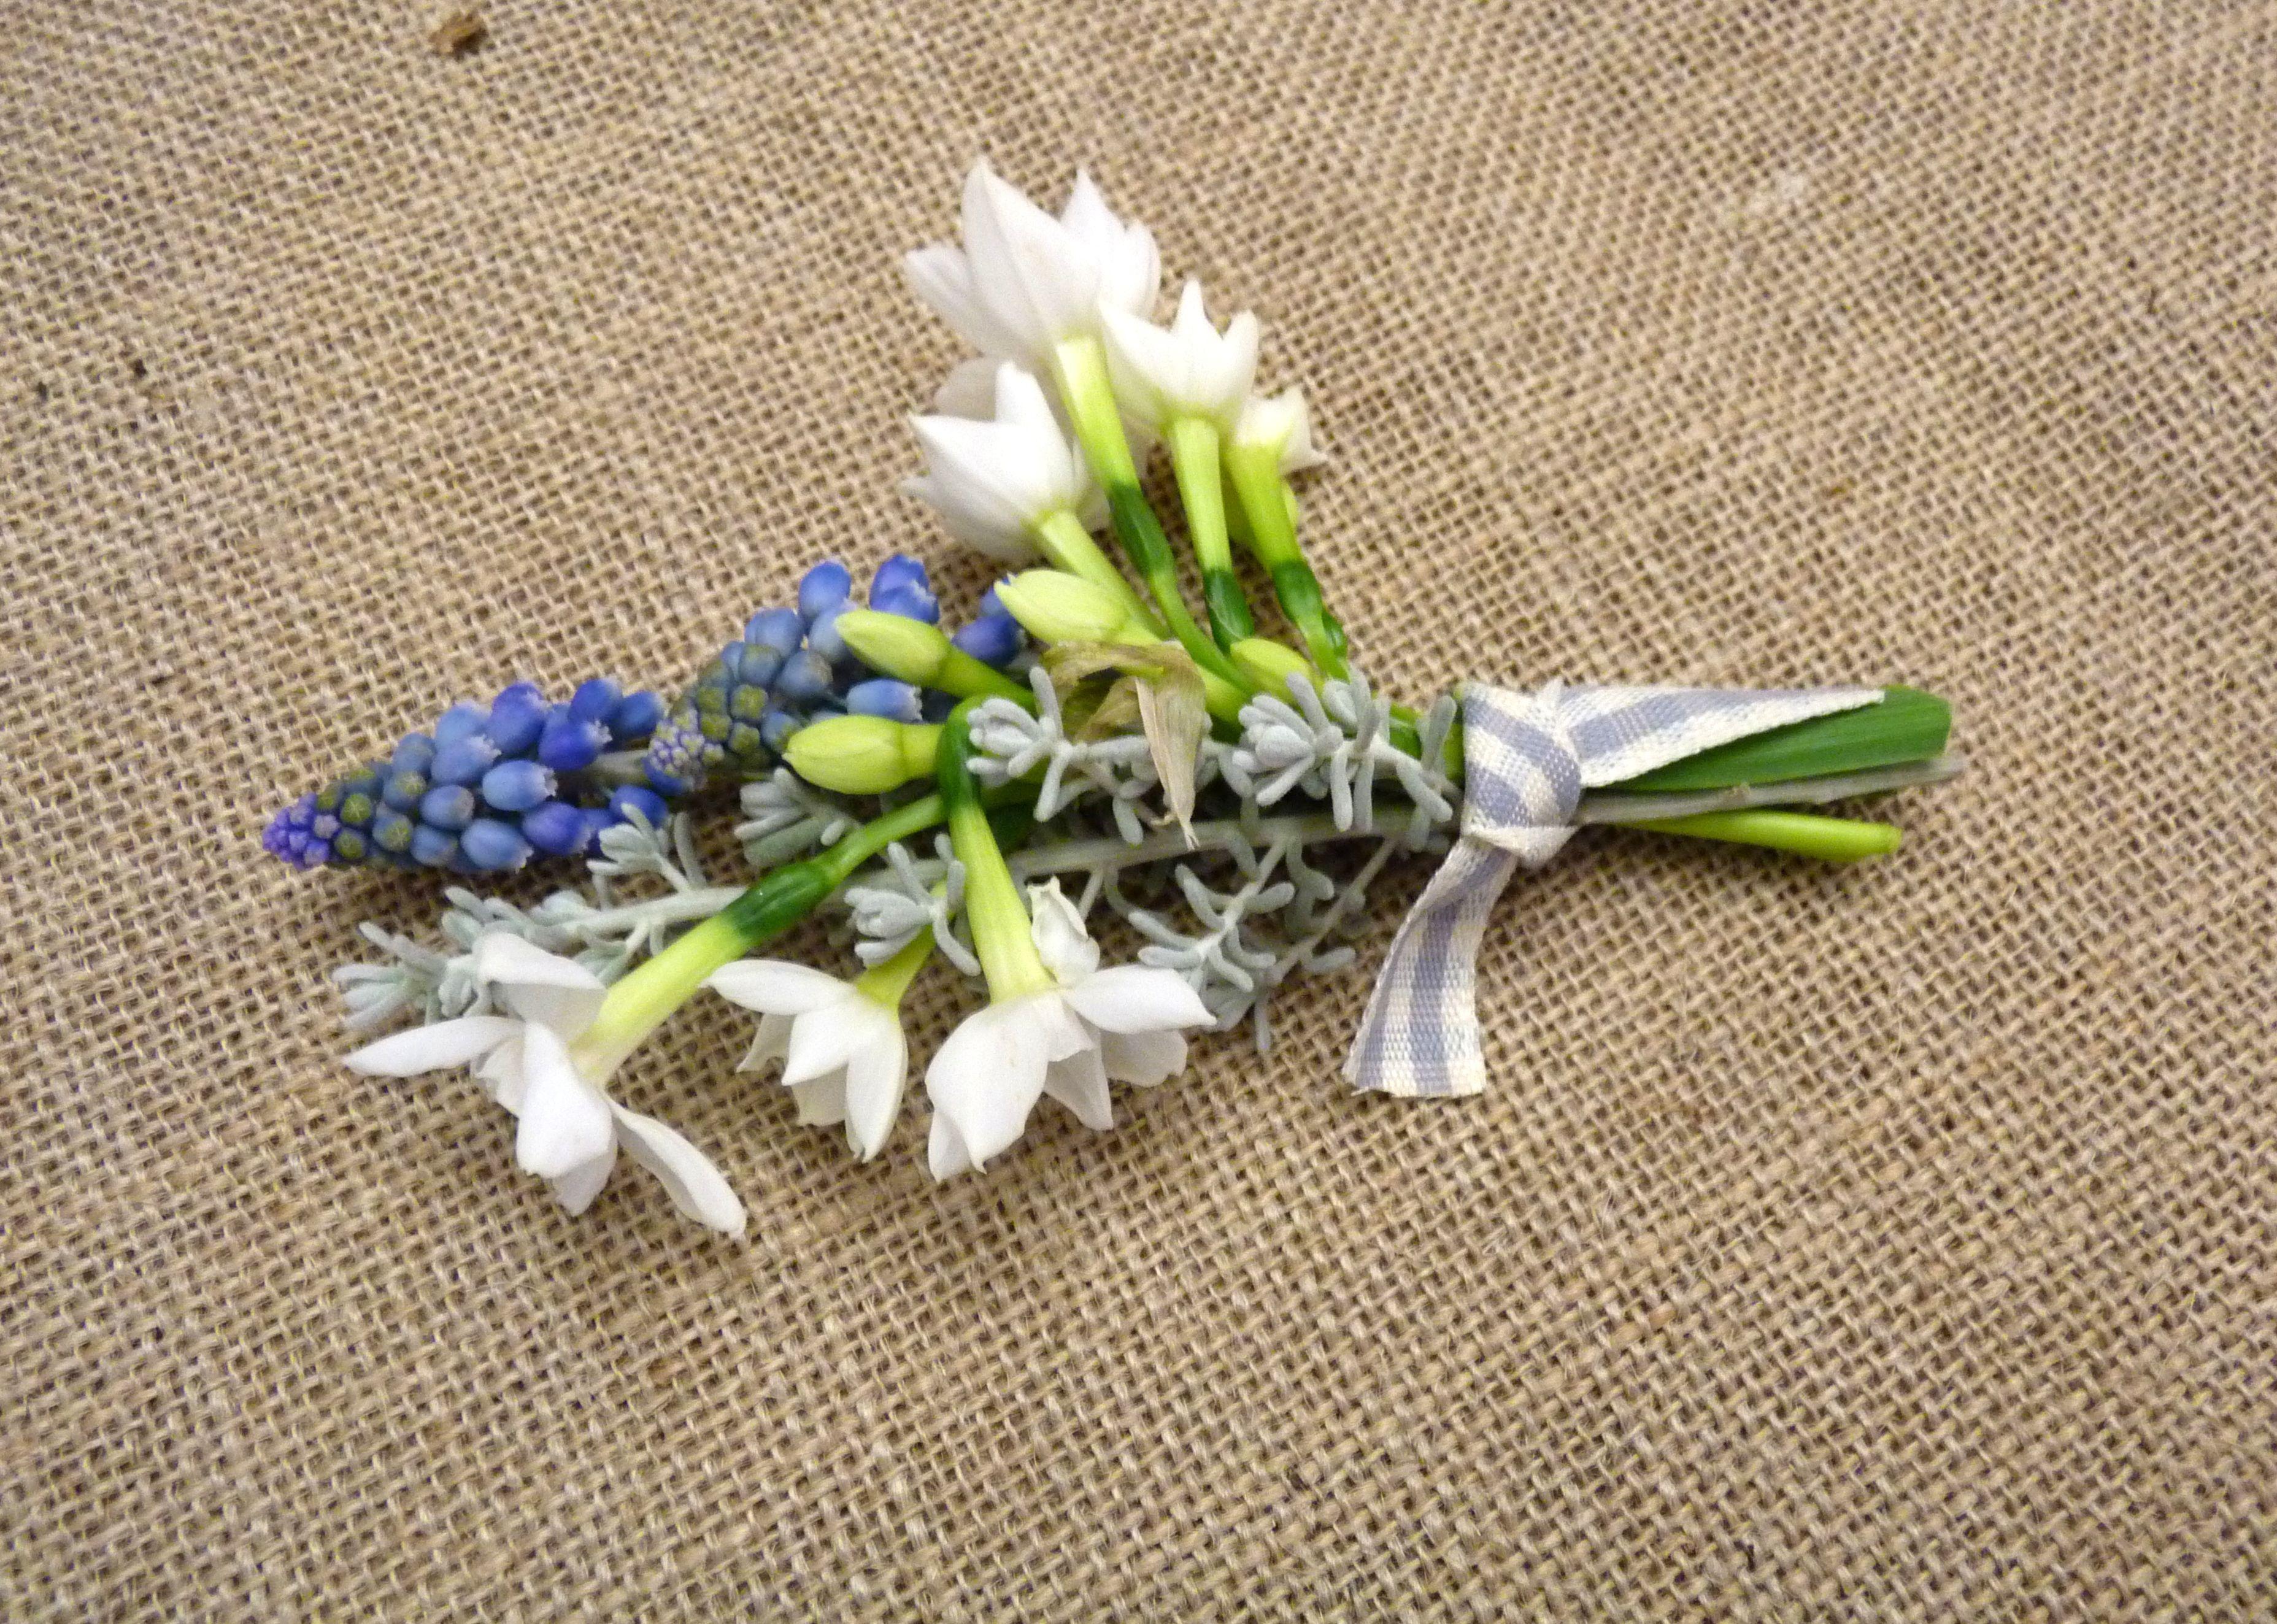 Seasonal wedding buttonholes spring wedding inspiration why seasonal flowers february spring wedding flowers the rose shed mightylinksfo